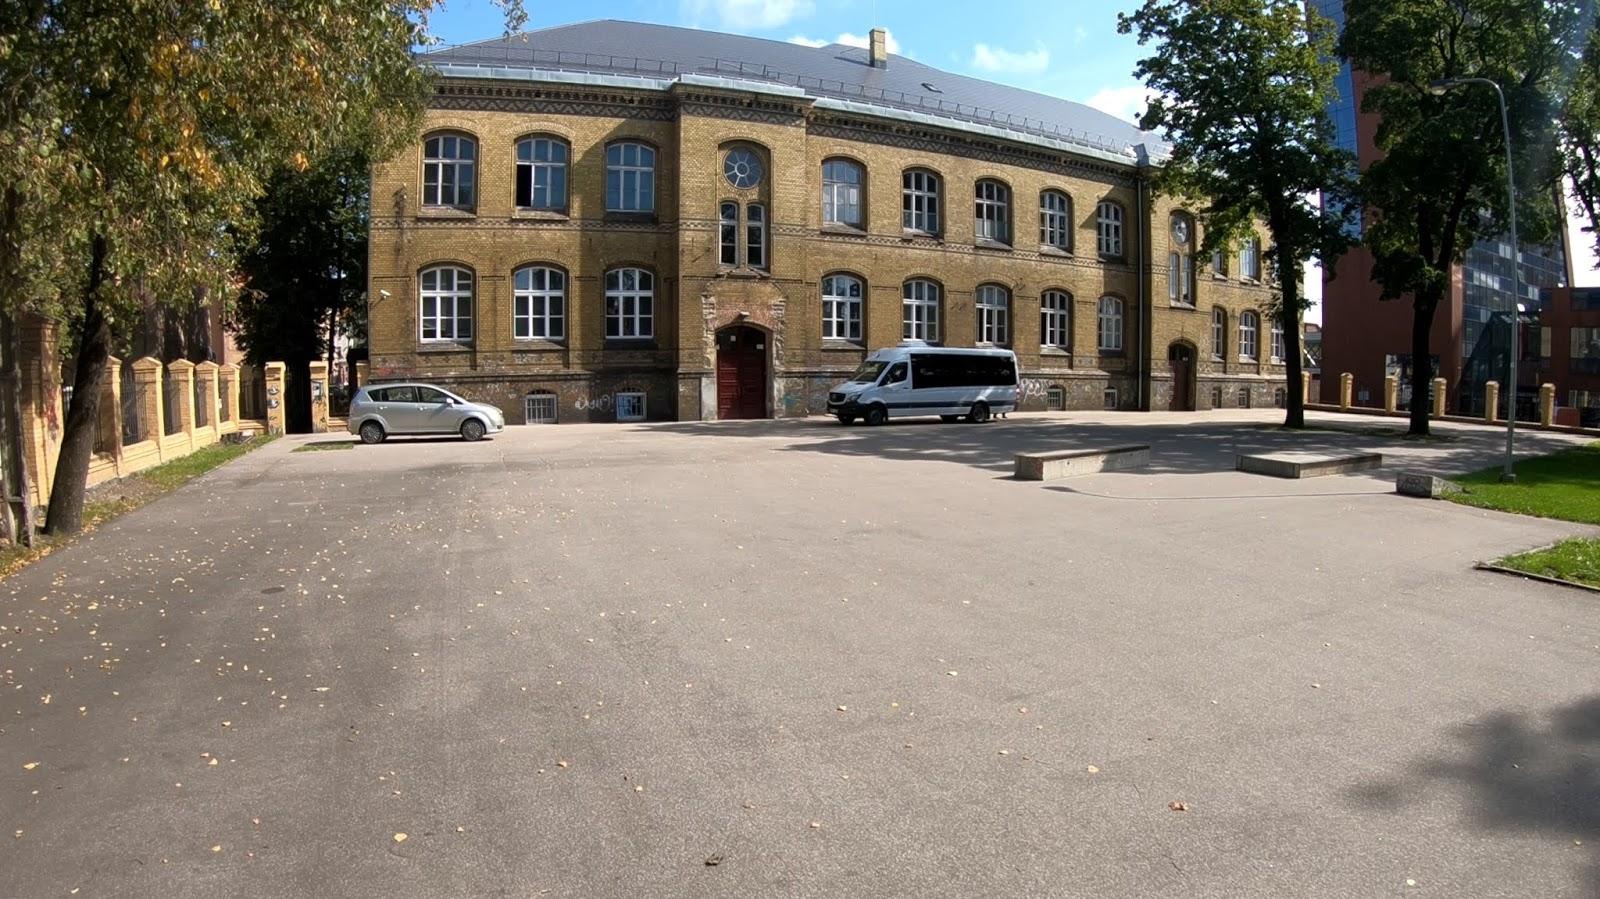 Дворик центра молодежи. Раньше тут был скейтпарк. 4 фото